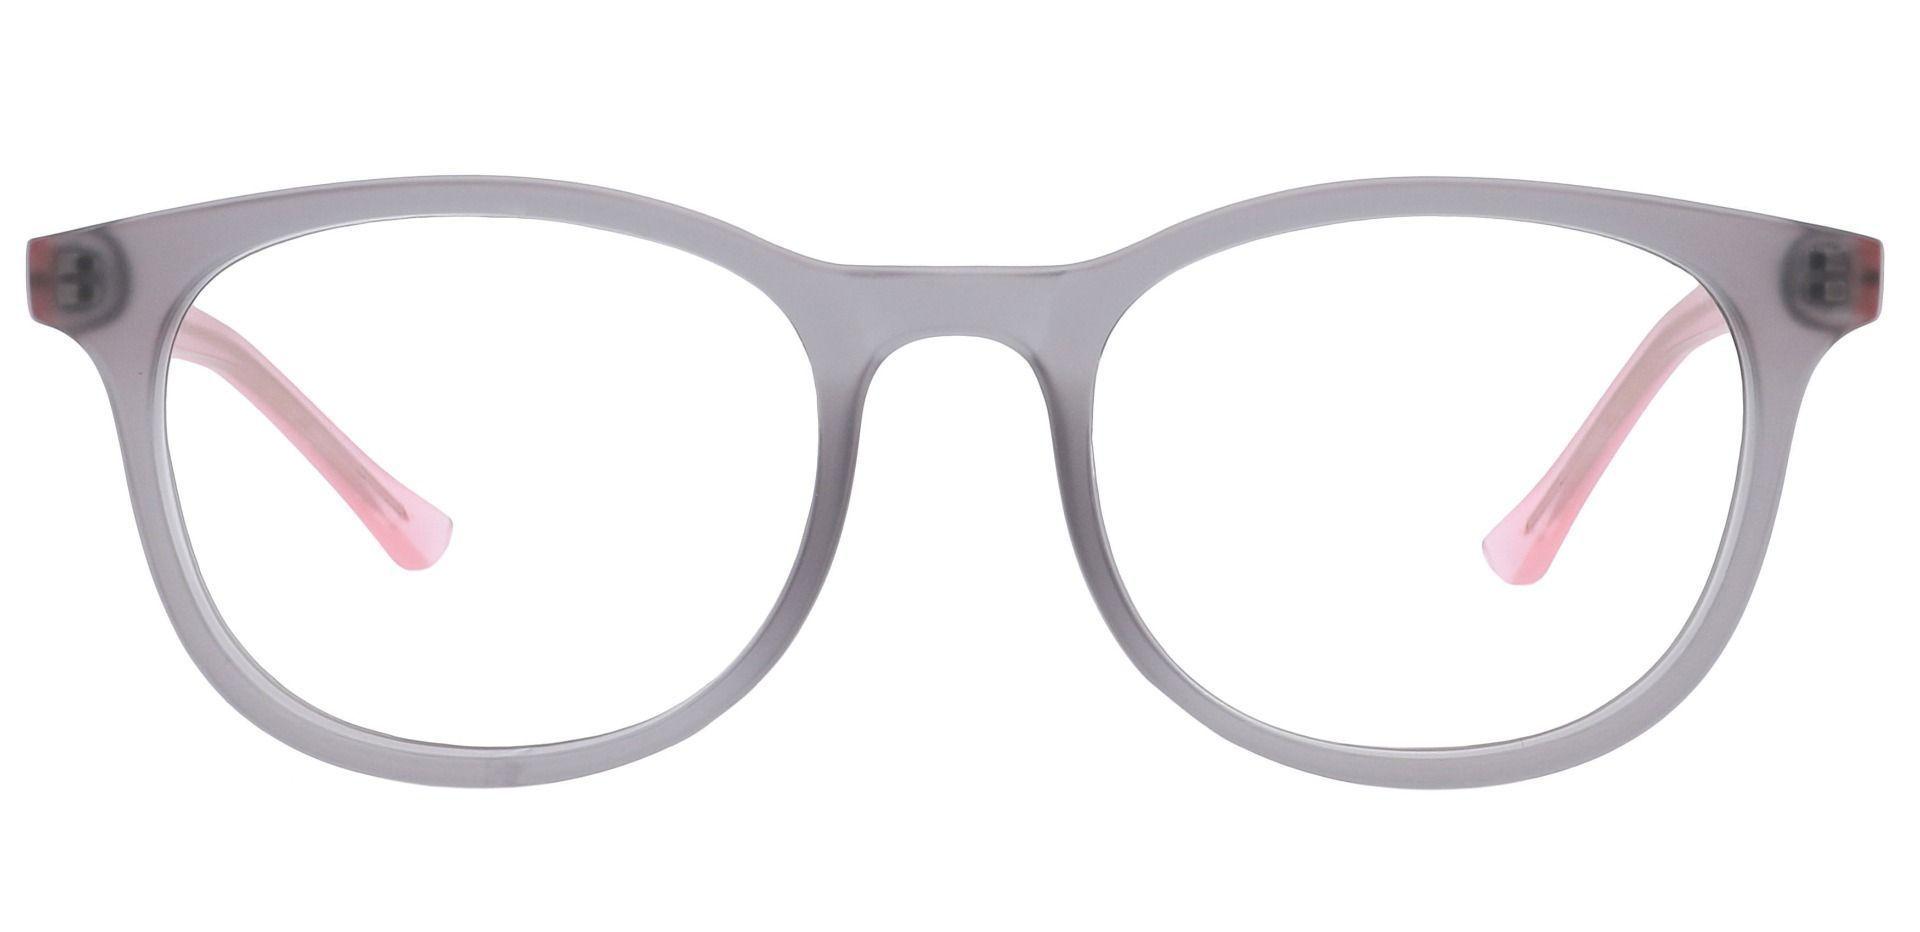 Gretchen Oval Progressive Glasses - Matte Grey Crystal